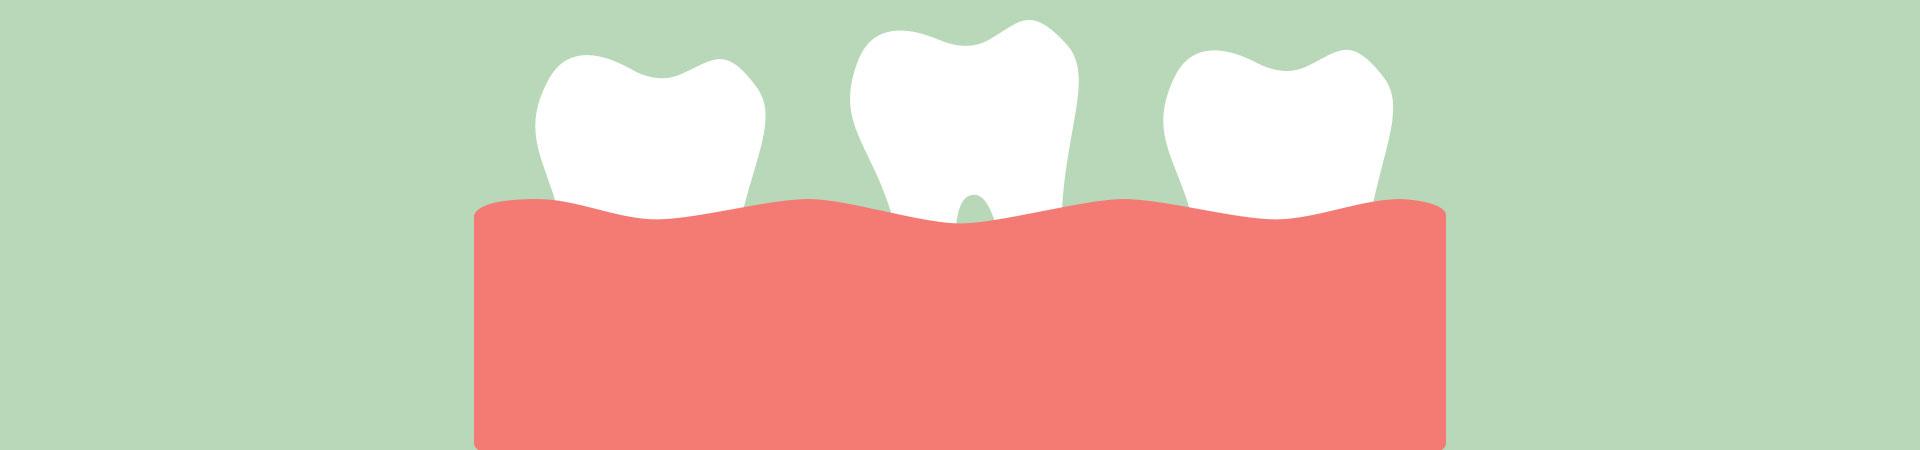 Treatment for Loose Teeth